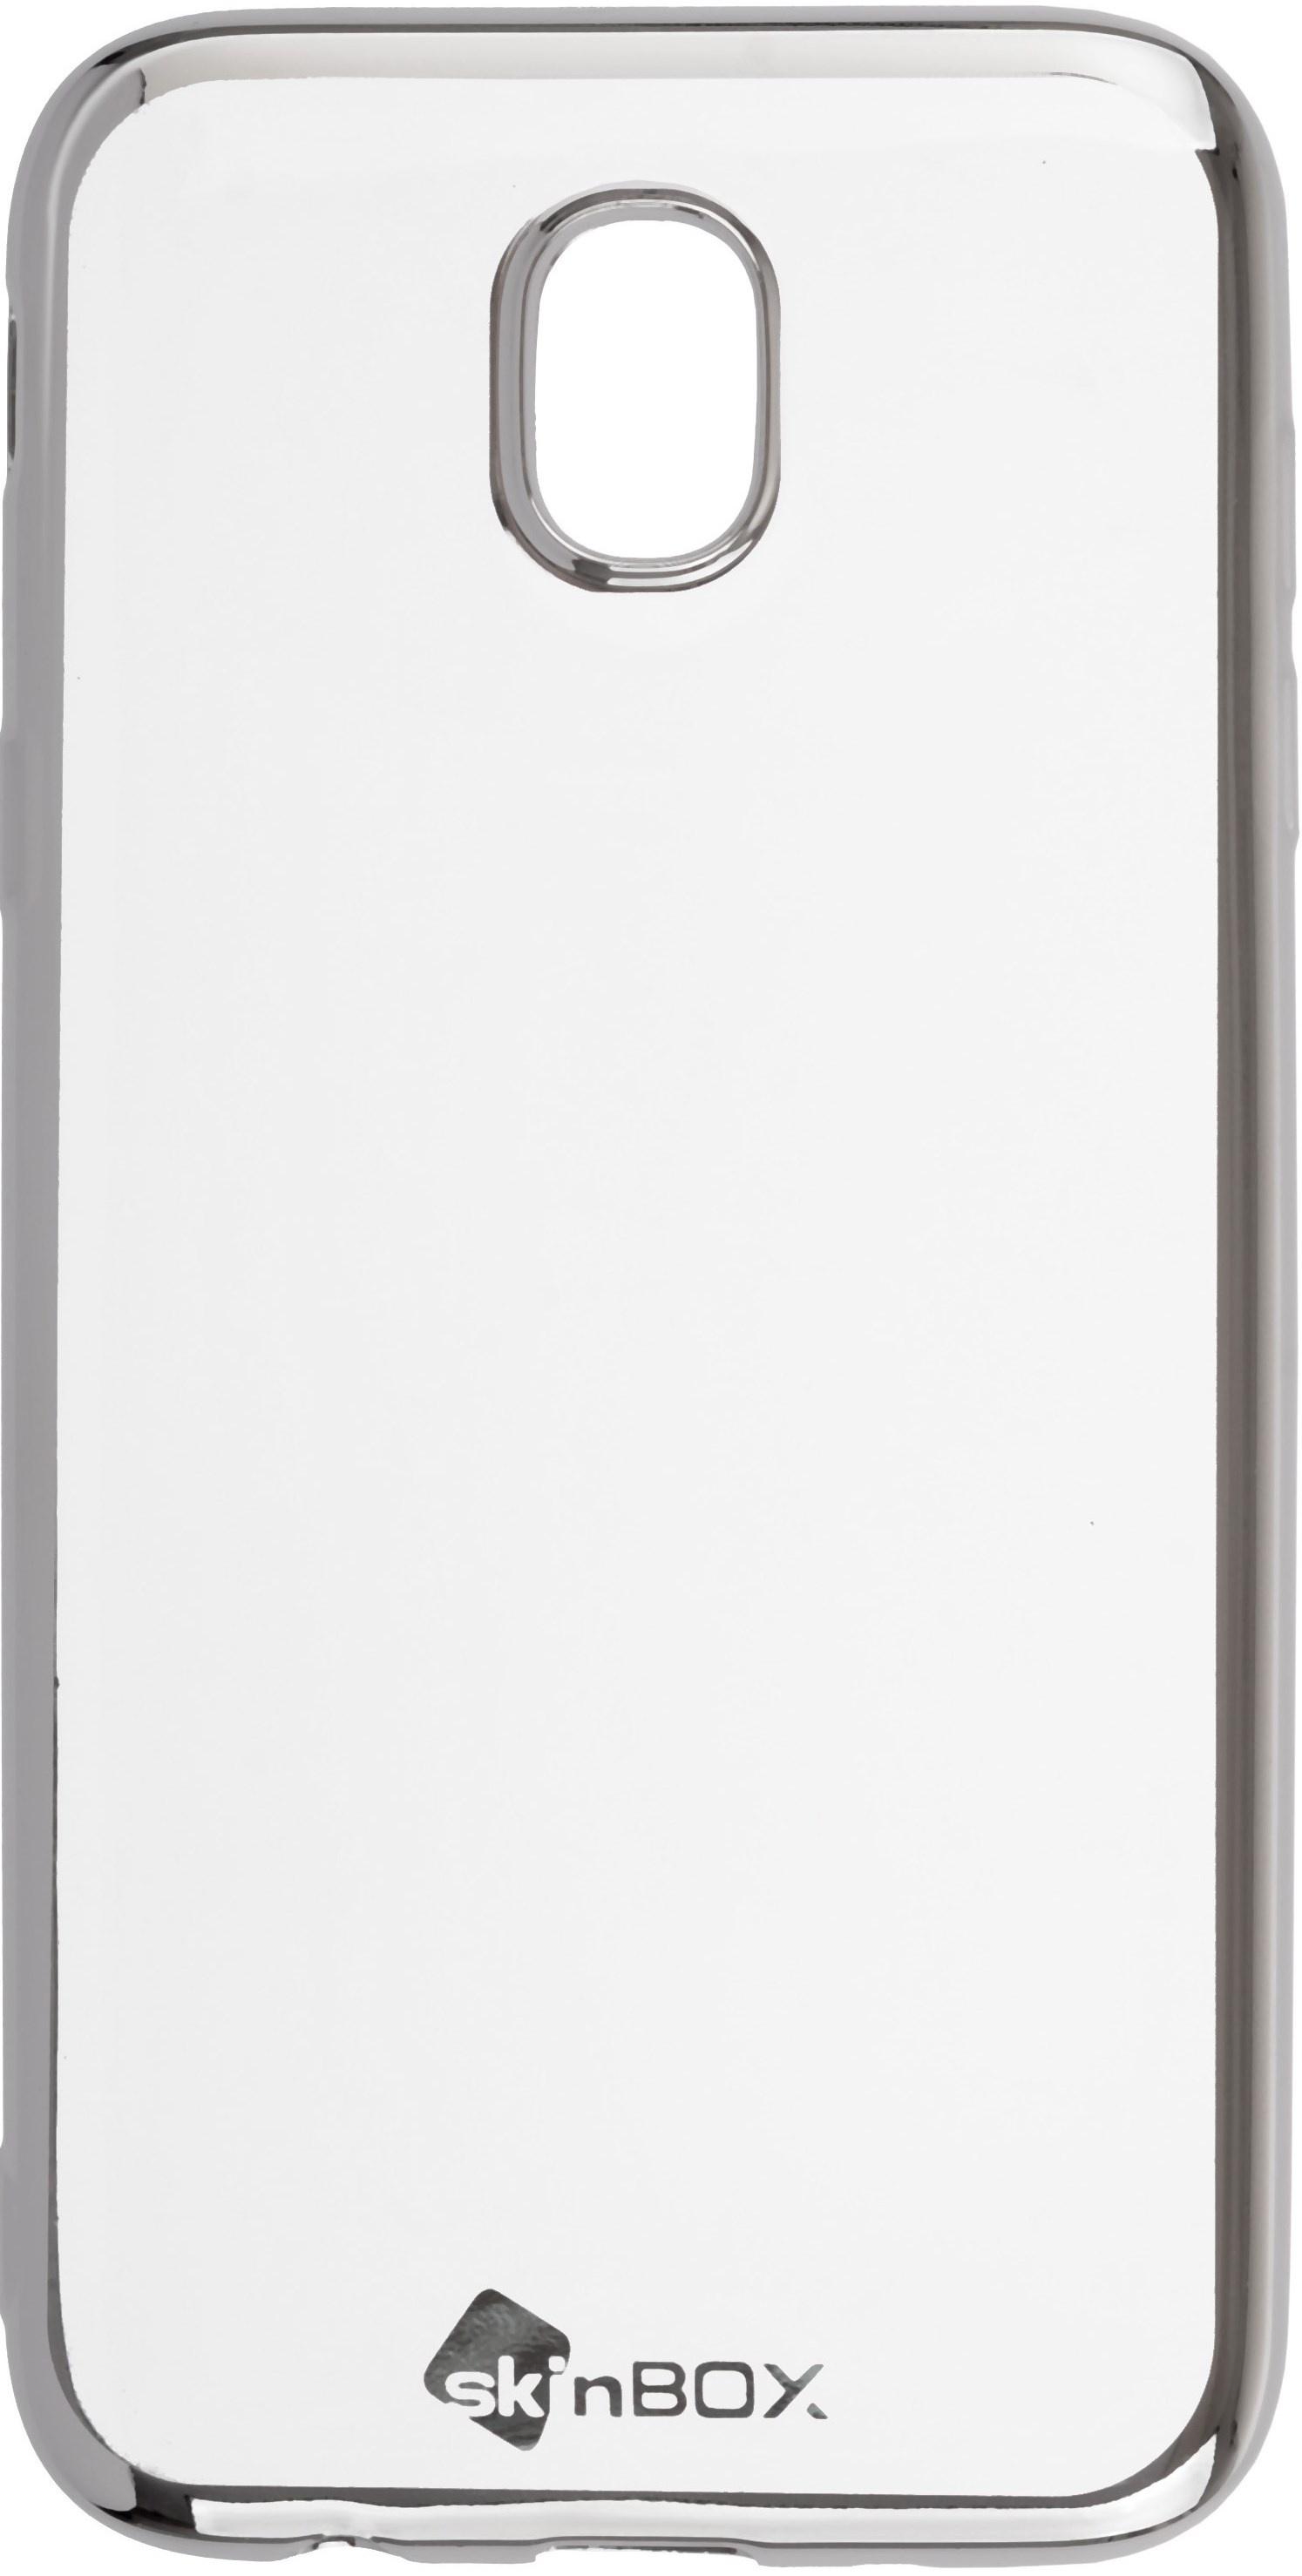 Чехол для сотового телефона skinBOX Silicone chrome border, 4630042529786, серебристый чехол для сотового телефона skinbox silicone chrome border 4630042524514 серебристый